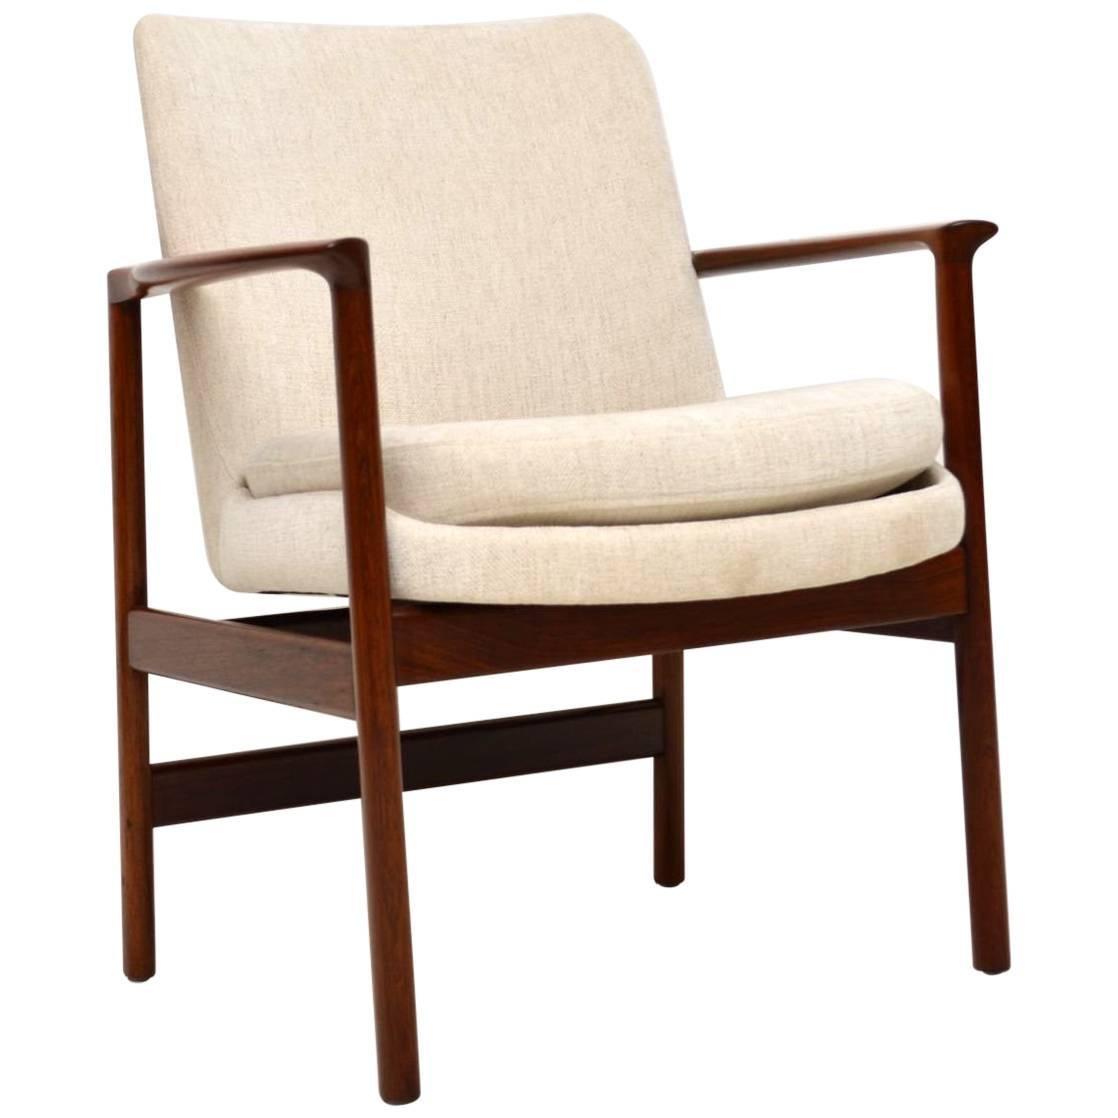 1960s Vintage Danish Armchair For Sale